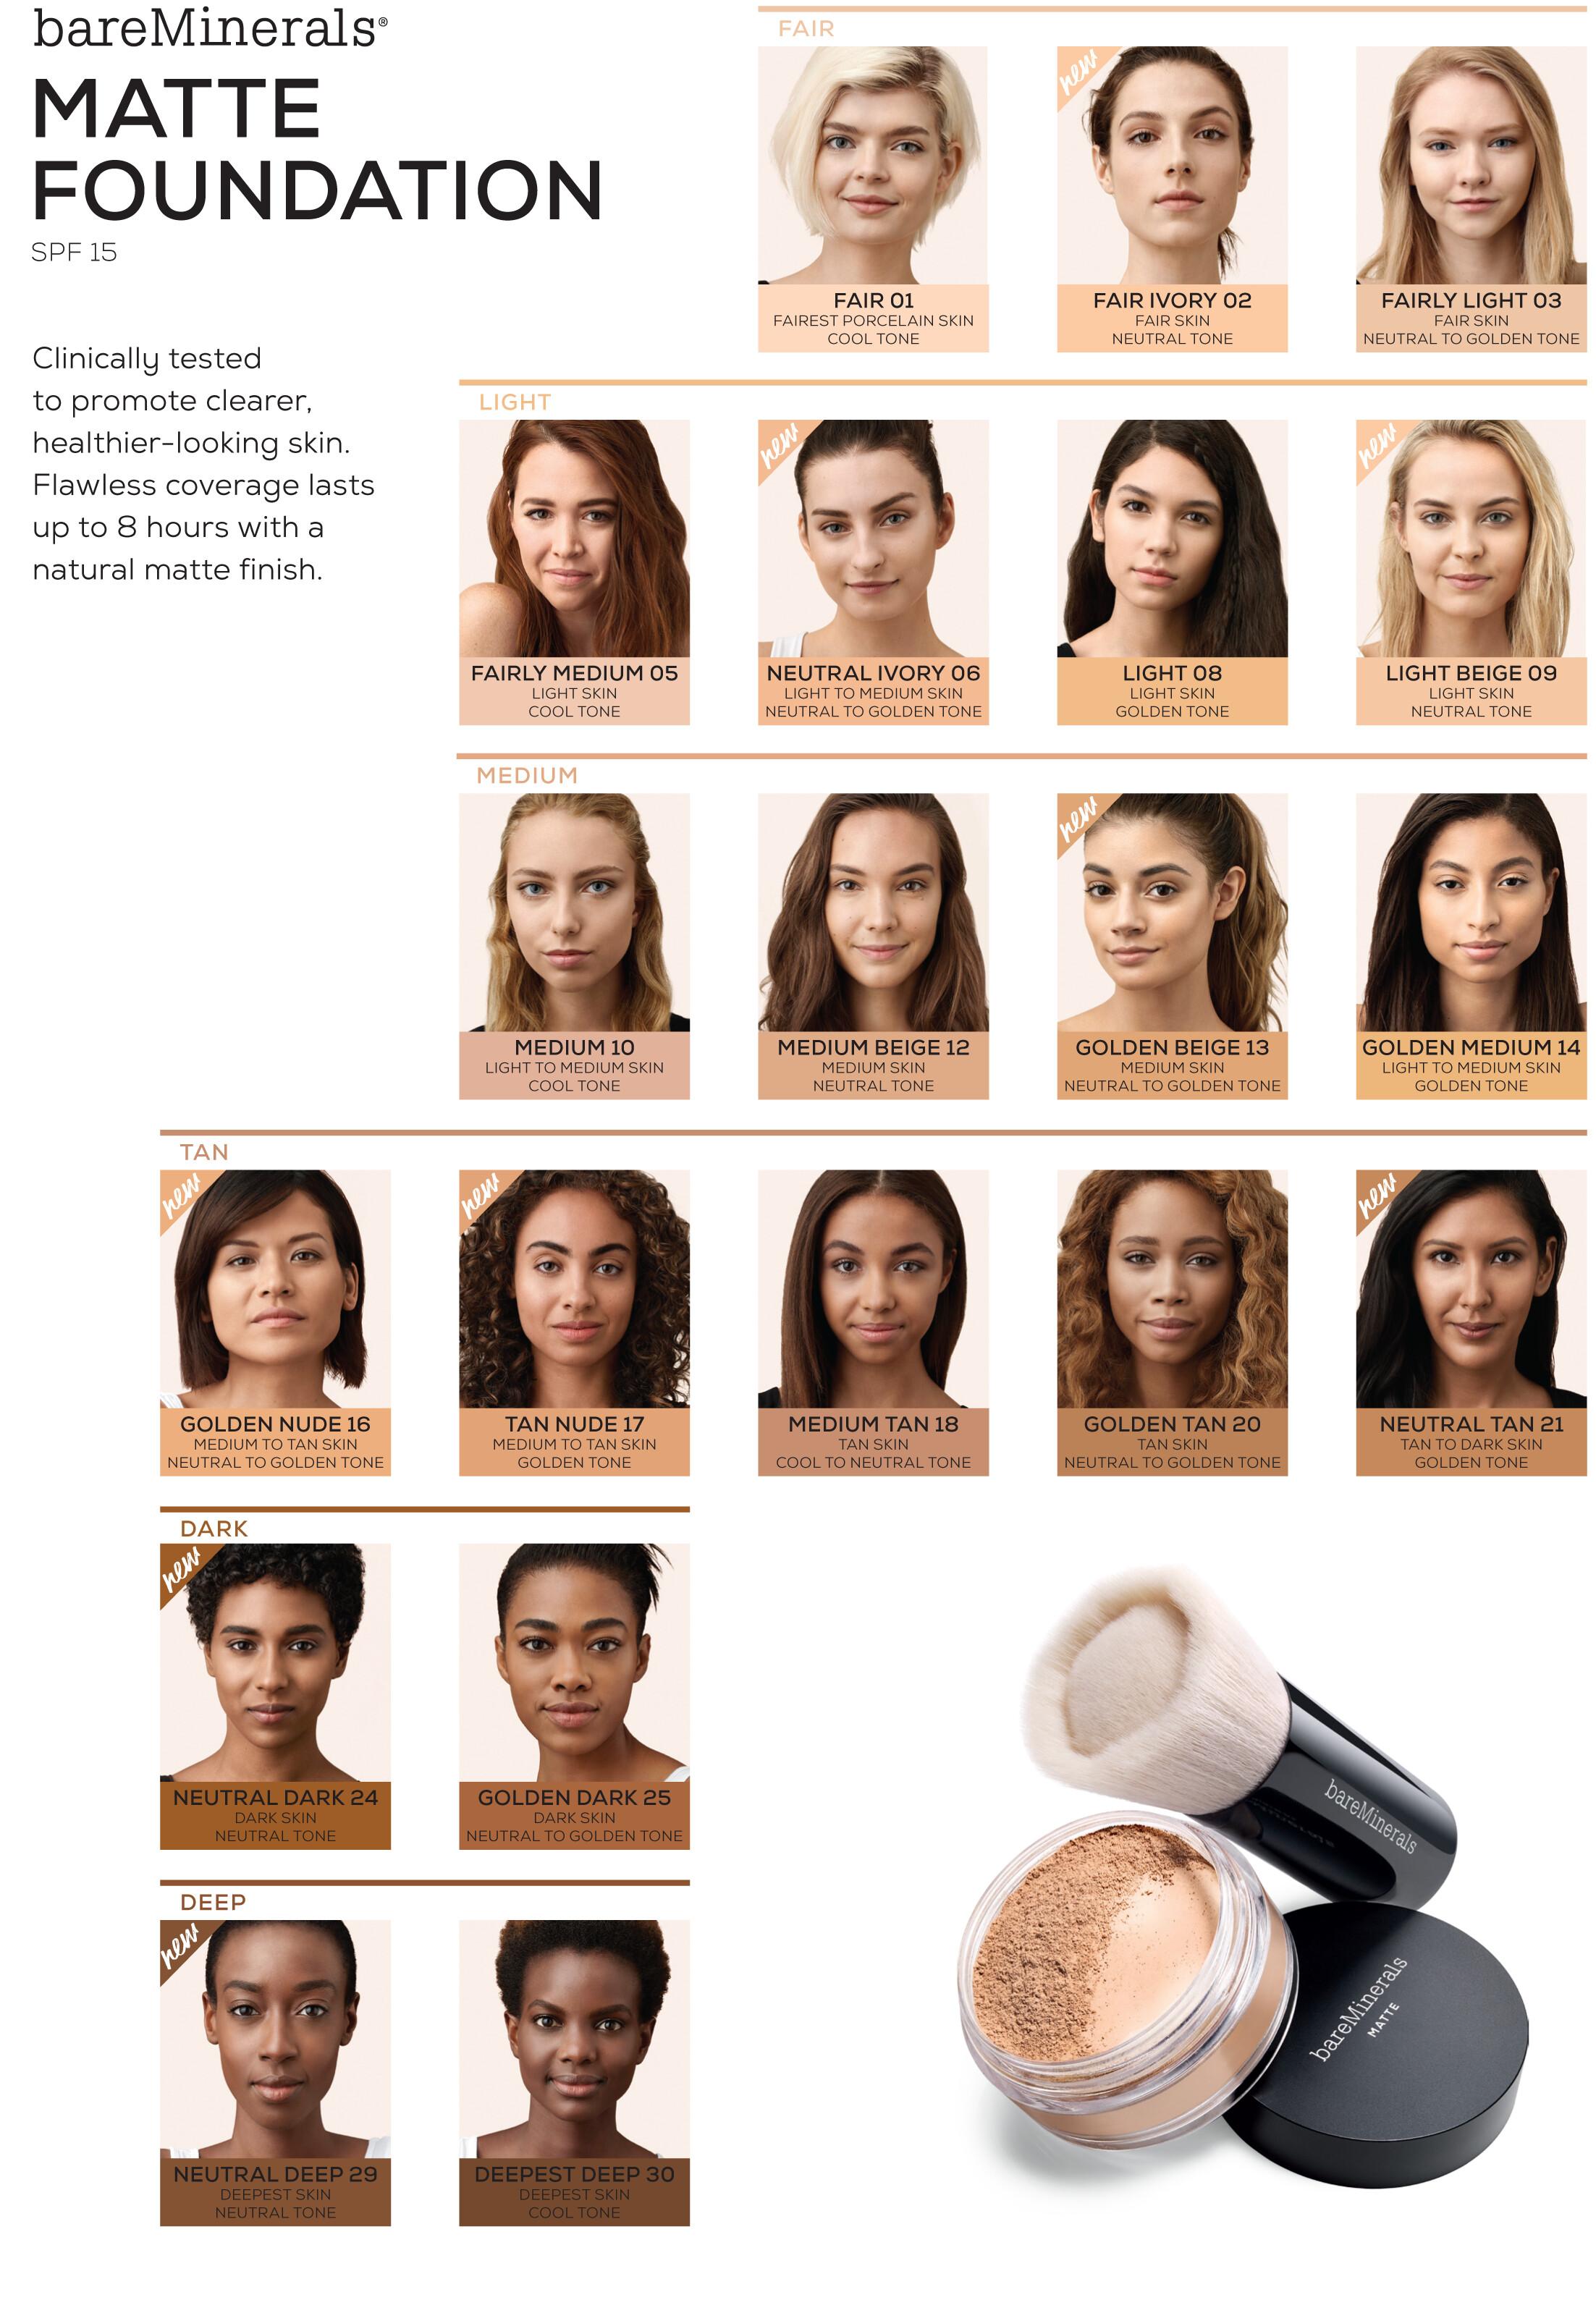 Is Bare Minerals Makeup Cruelty Free: BareMinerals Matte SPF15 Foundation